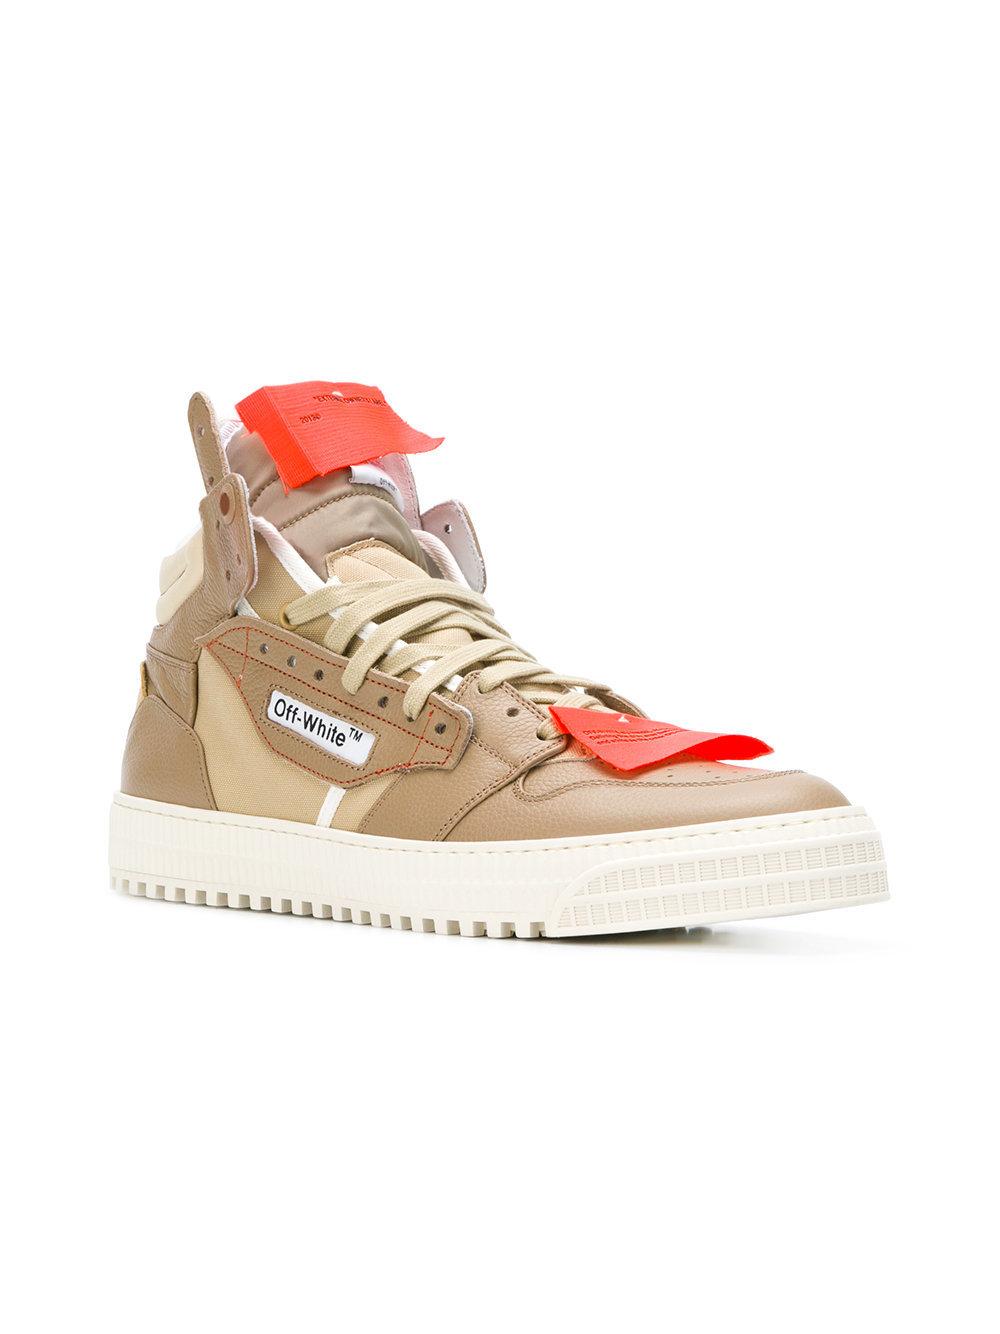 30 Hi Top Sneakers, $553   farfetch